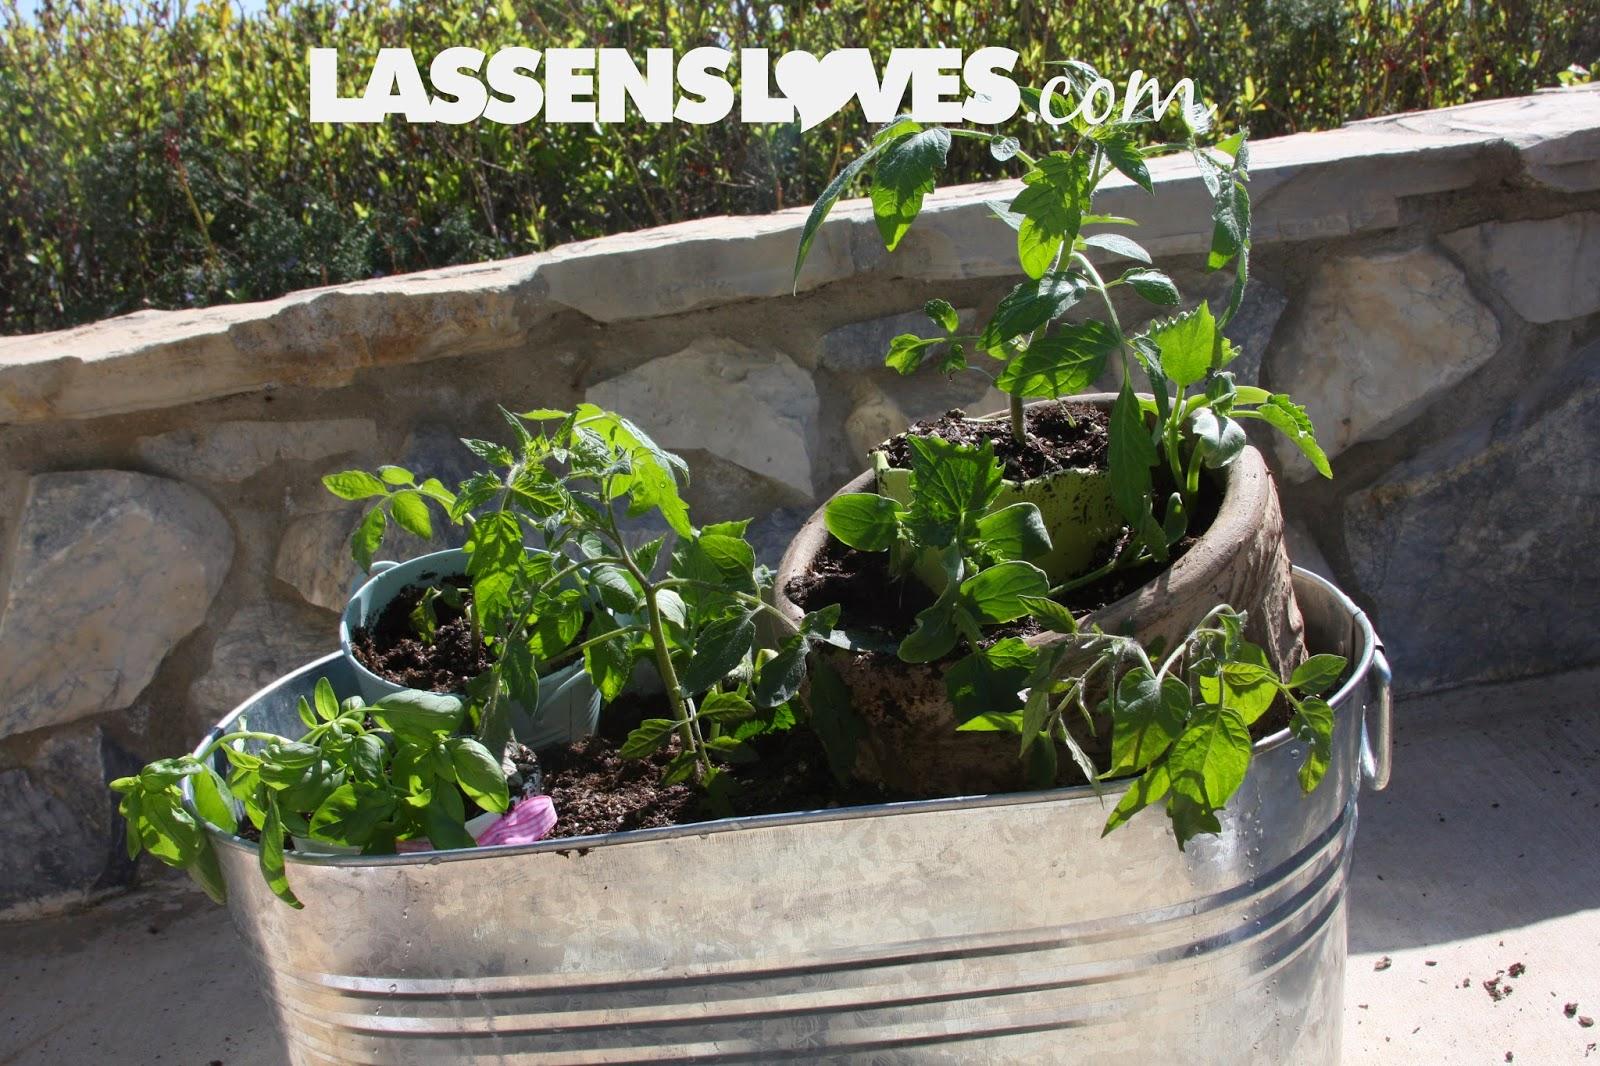 container+gardening, Patio+gardening, organic+gardening